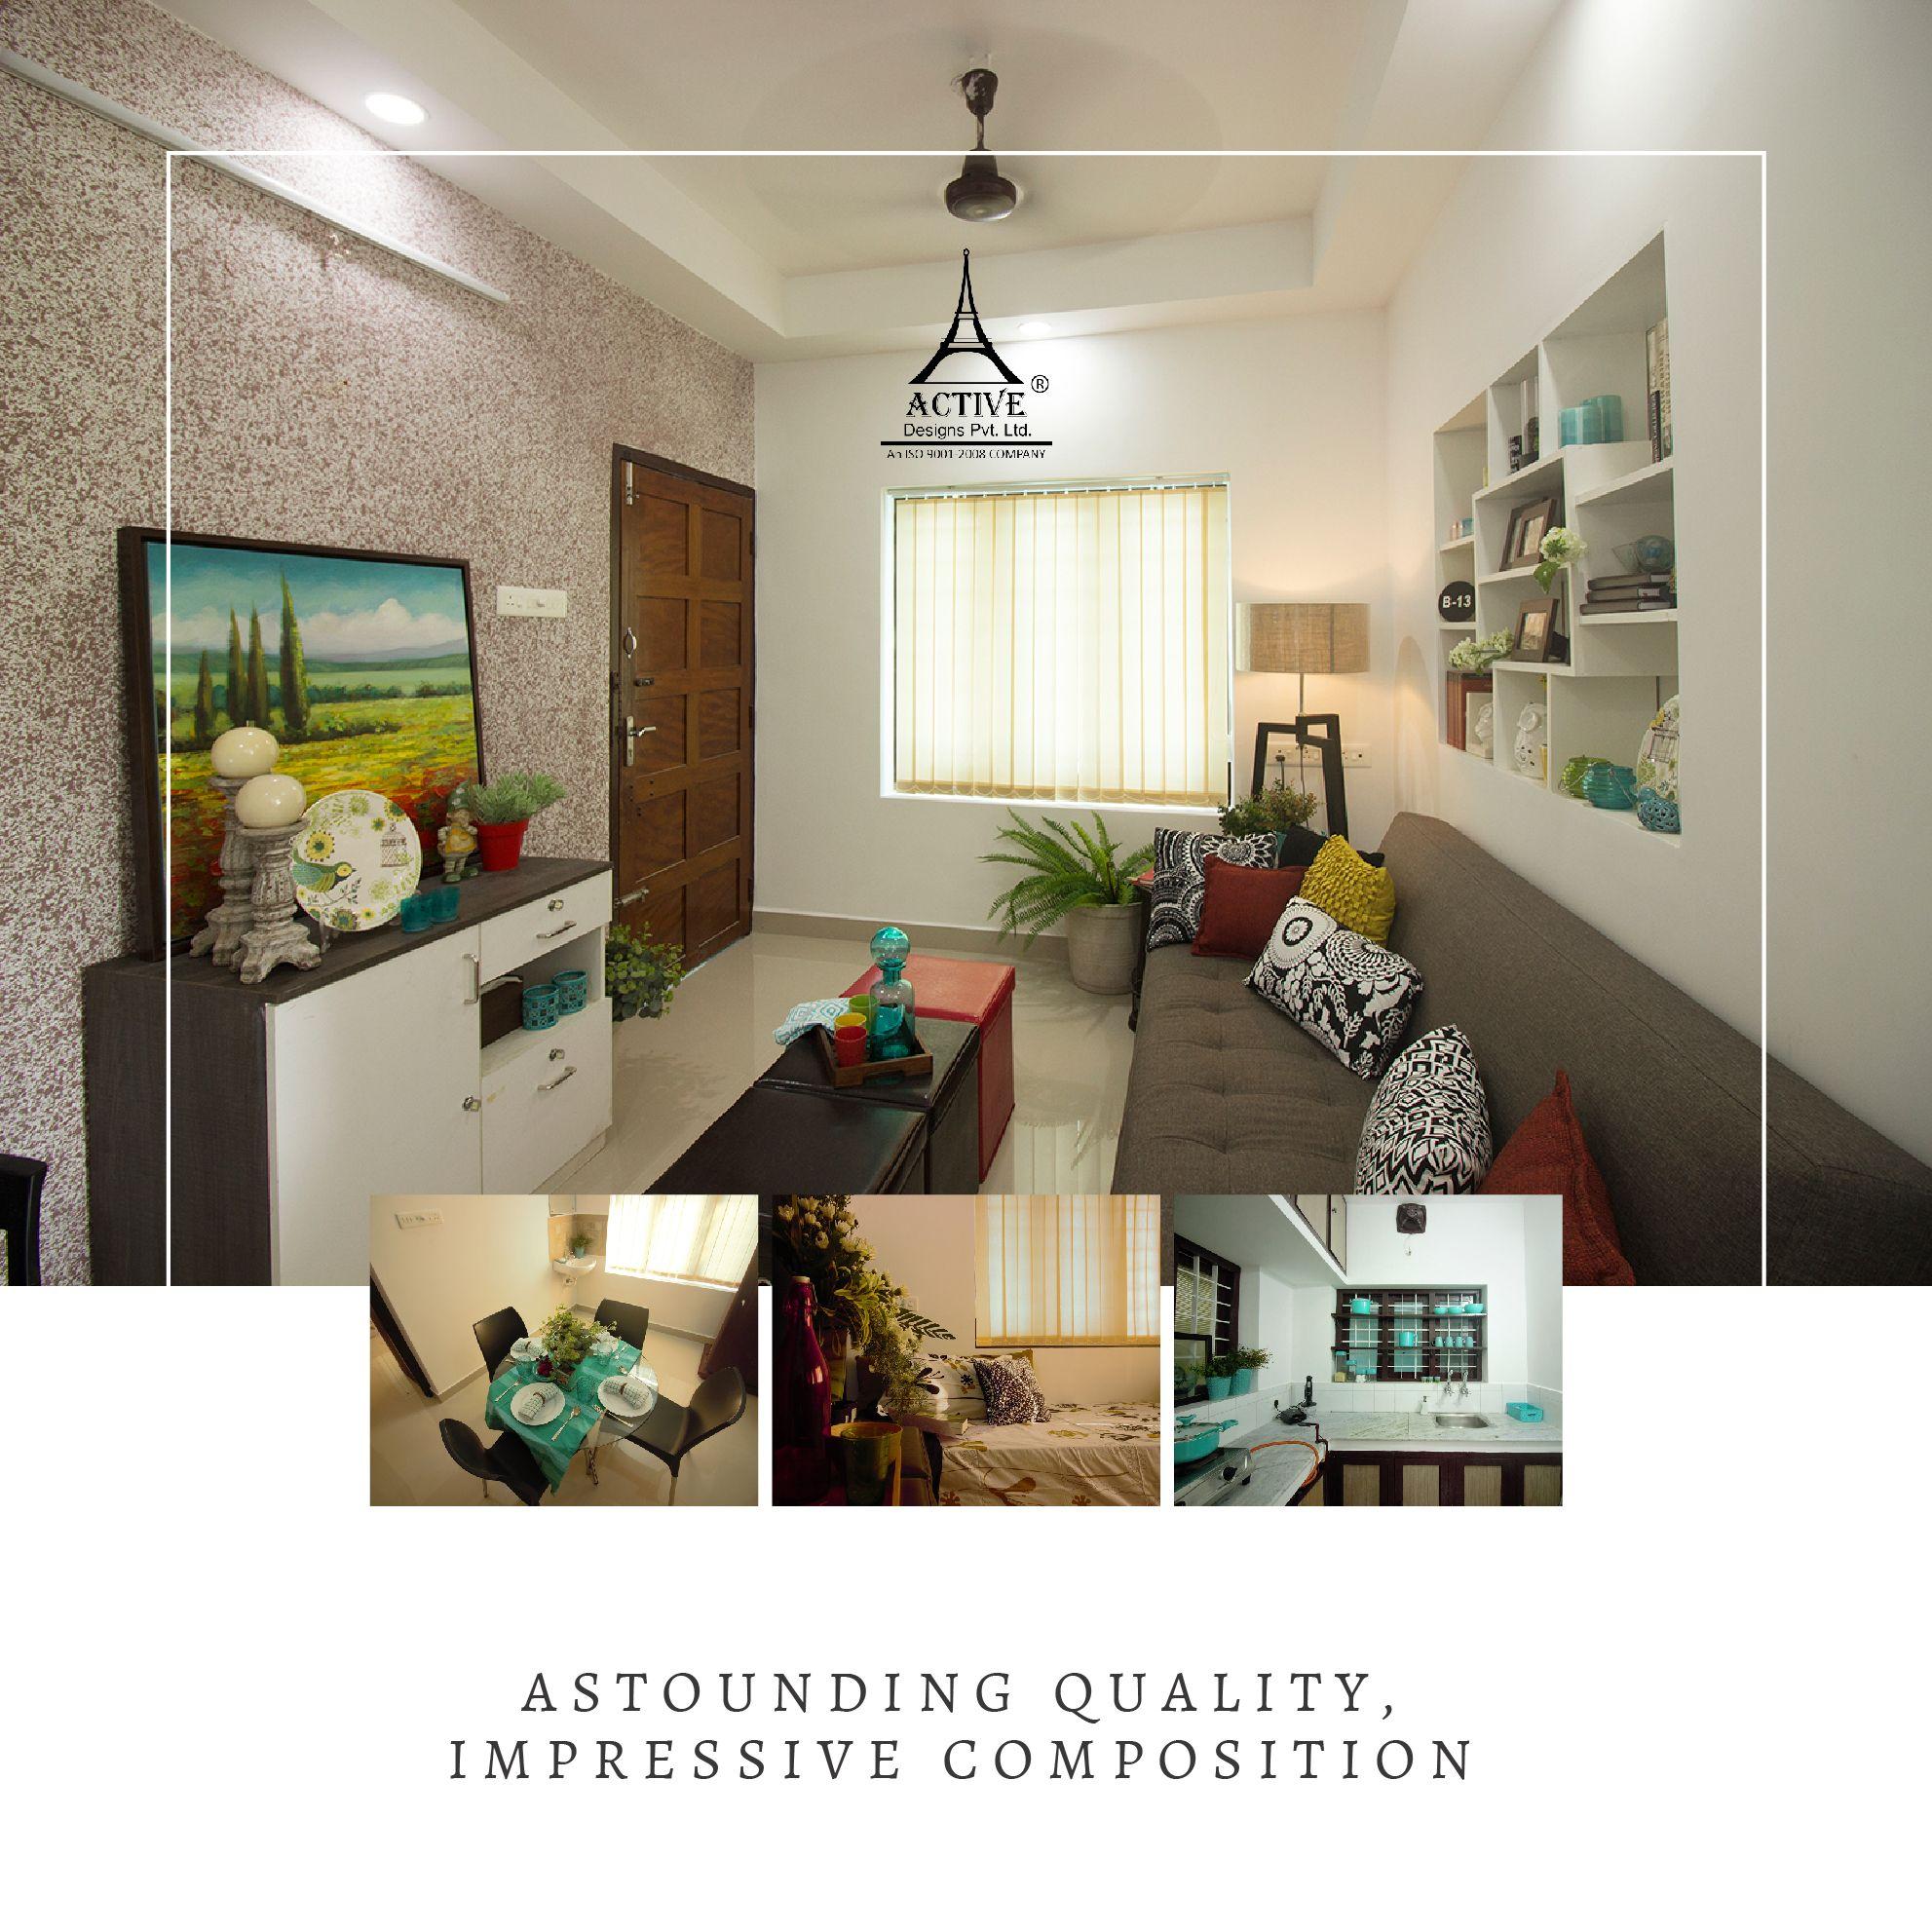 Being The Best Interior Designing Company In Kerala Active Designs Pvt Ltd Has Always Chosen Quality Over Quantity Best Interior Interior Interior Designers